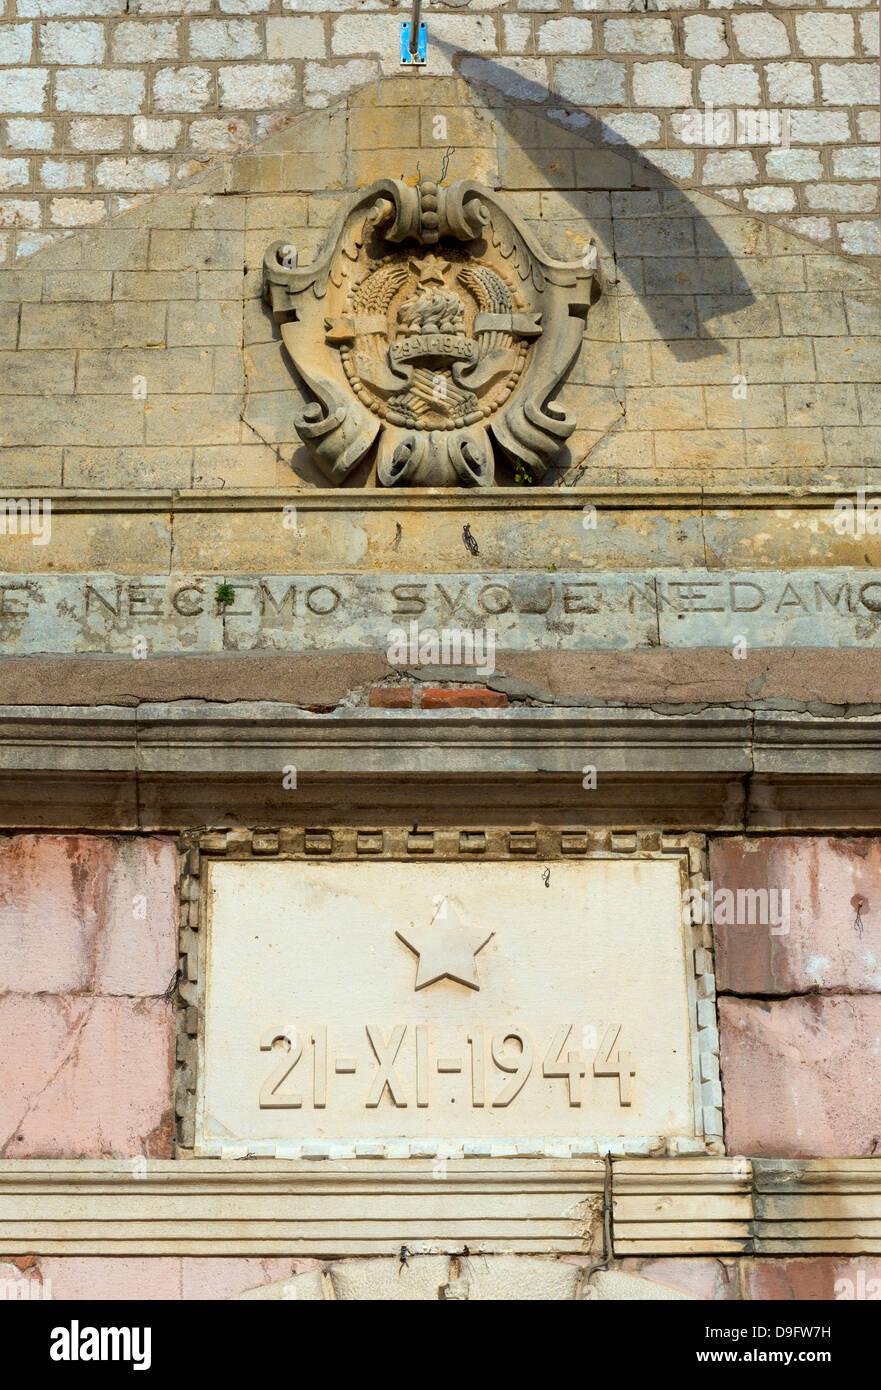 Old Town Gate, Old Town (Stari Grad), Kotor, Bay of Kotor, UNESCO World Heritage Site, Montenegro - Stock Image